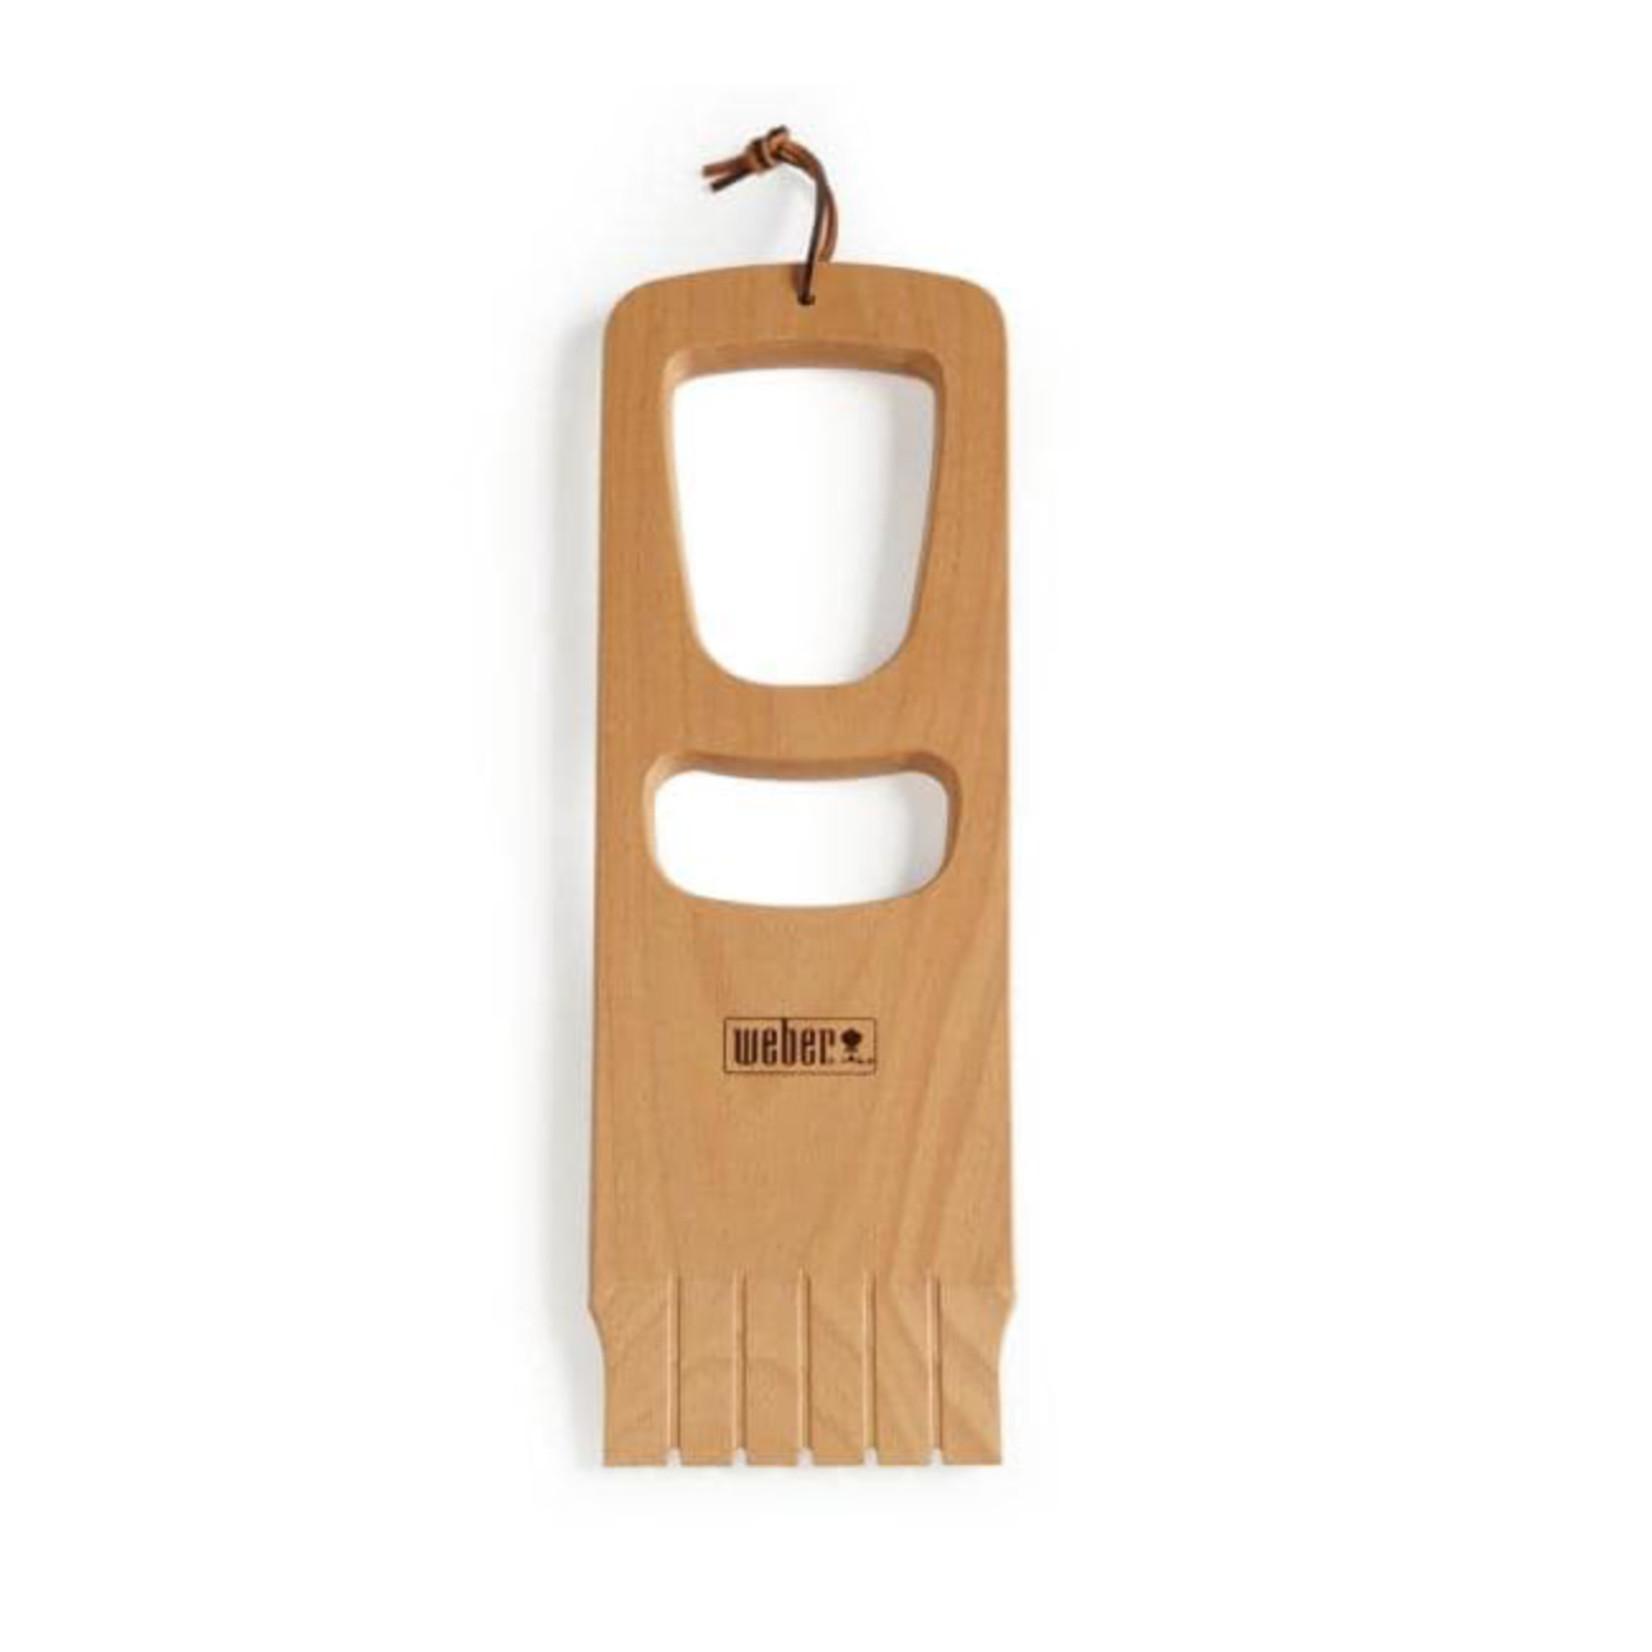 10531 Weber Wooden Grill Scraper